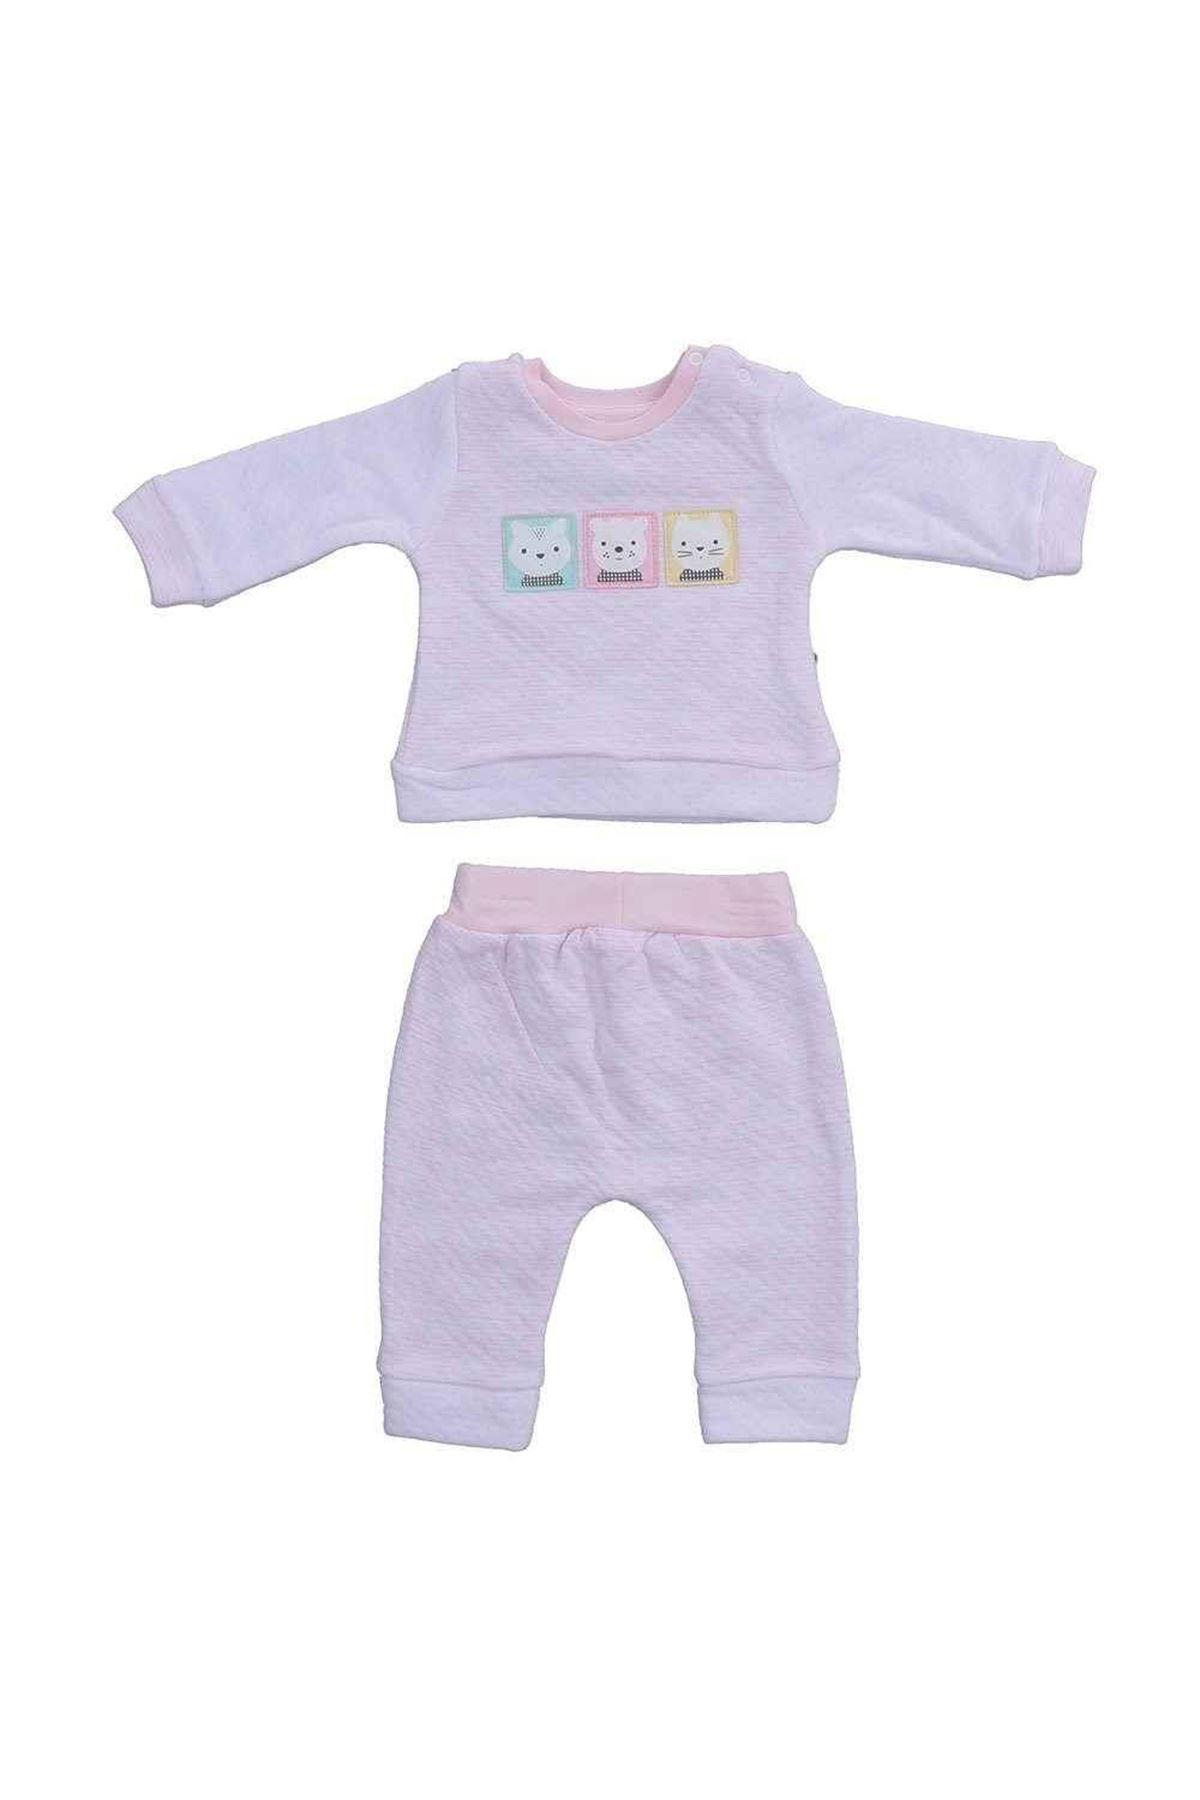 Tongs Baby 2li Bebe Takım 1765 Pembe